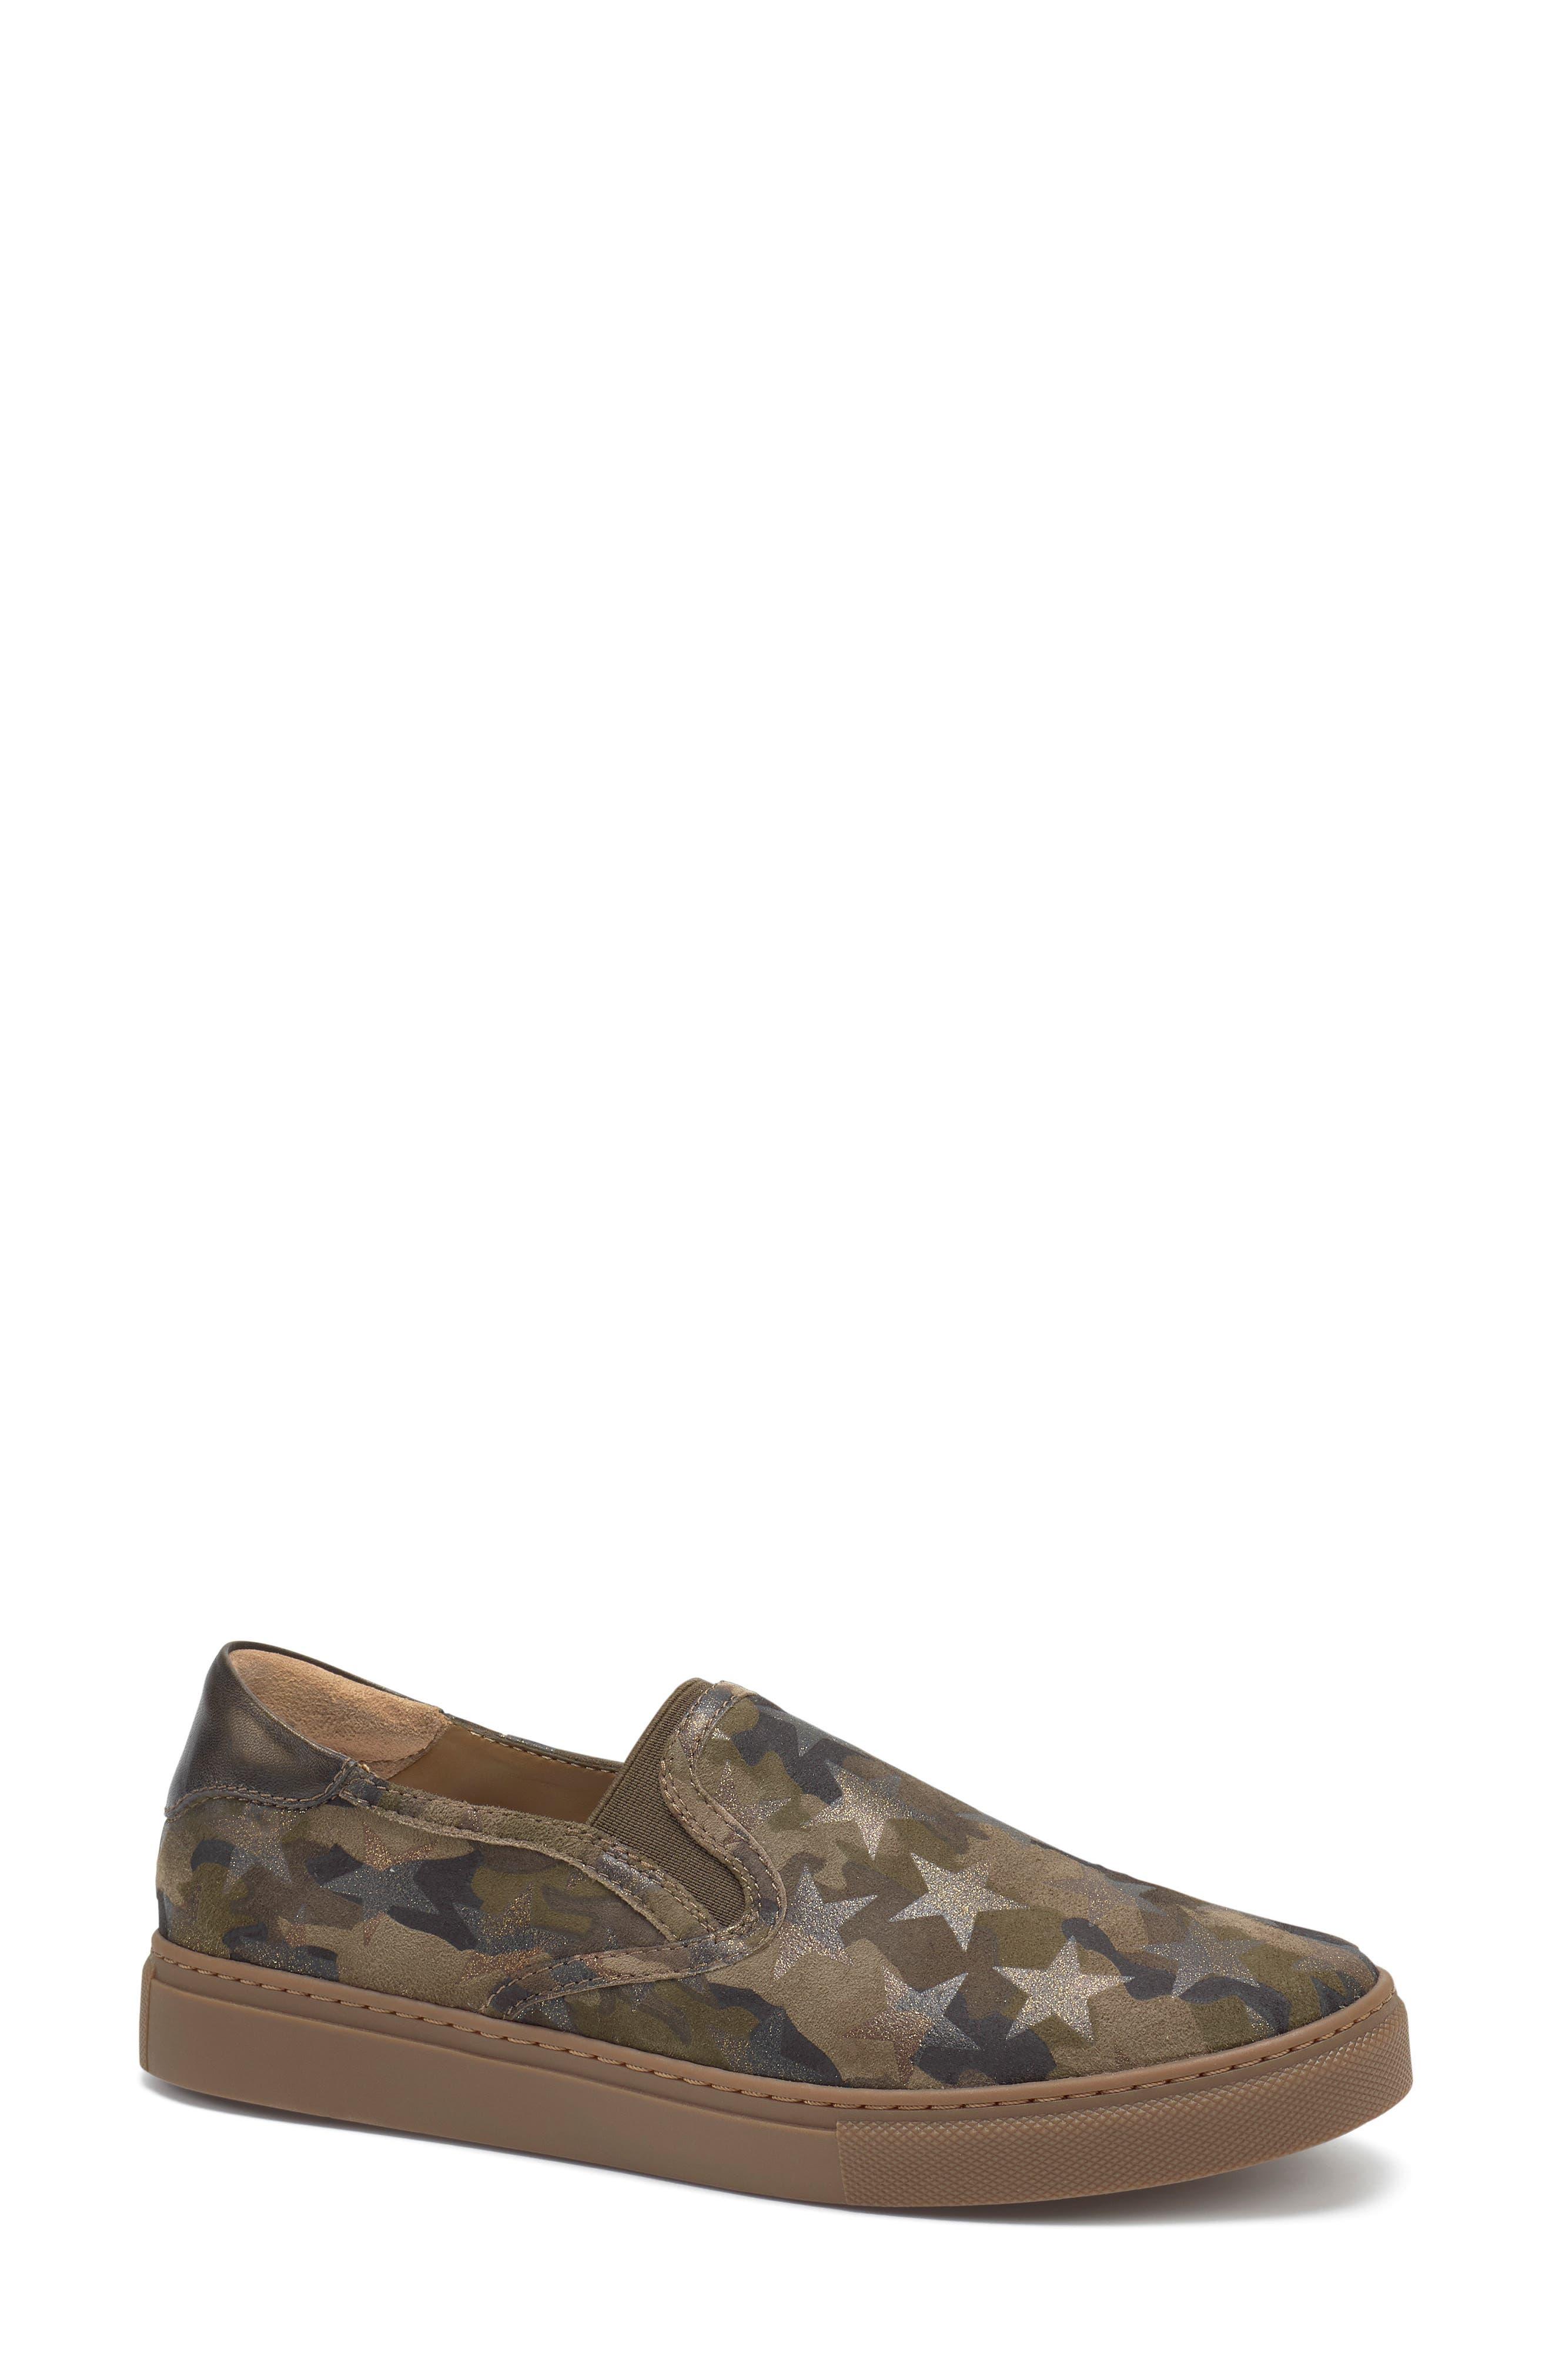 Trask Lillian Water Resistant Slip-On Sneaker- Green